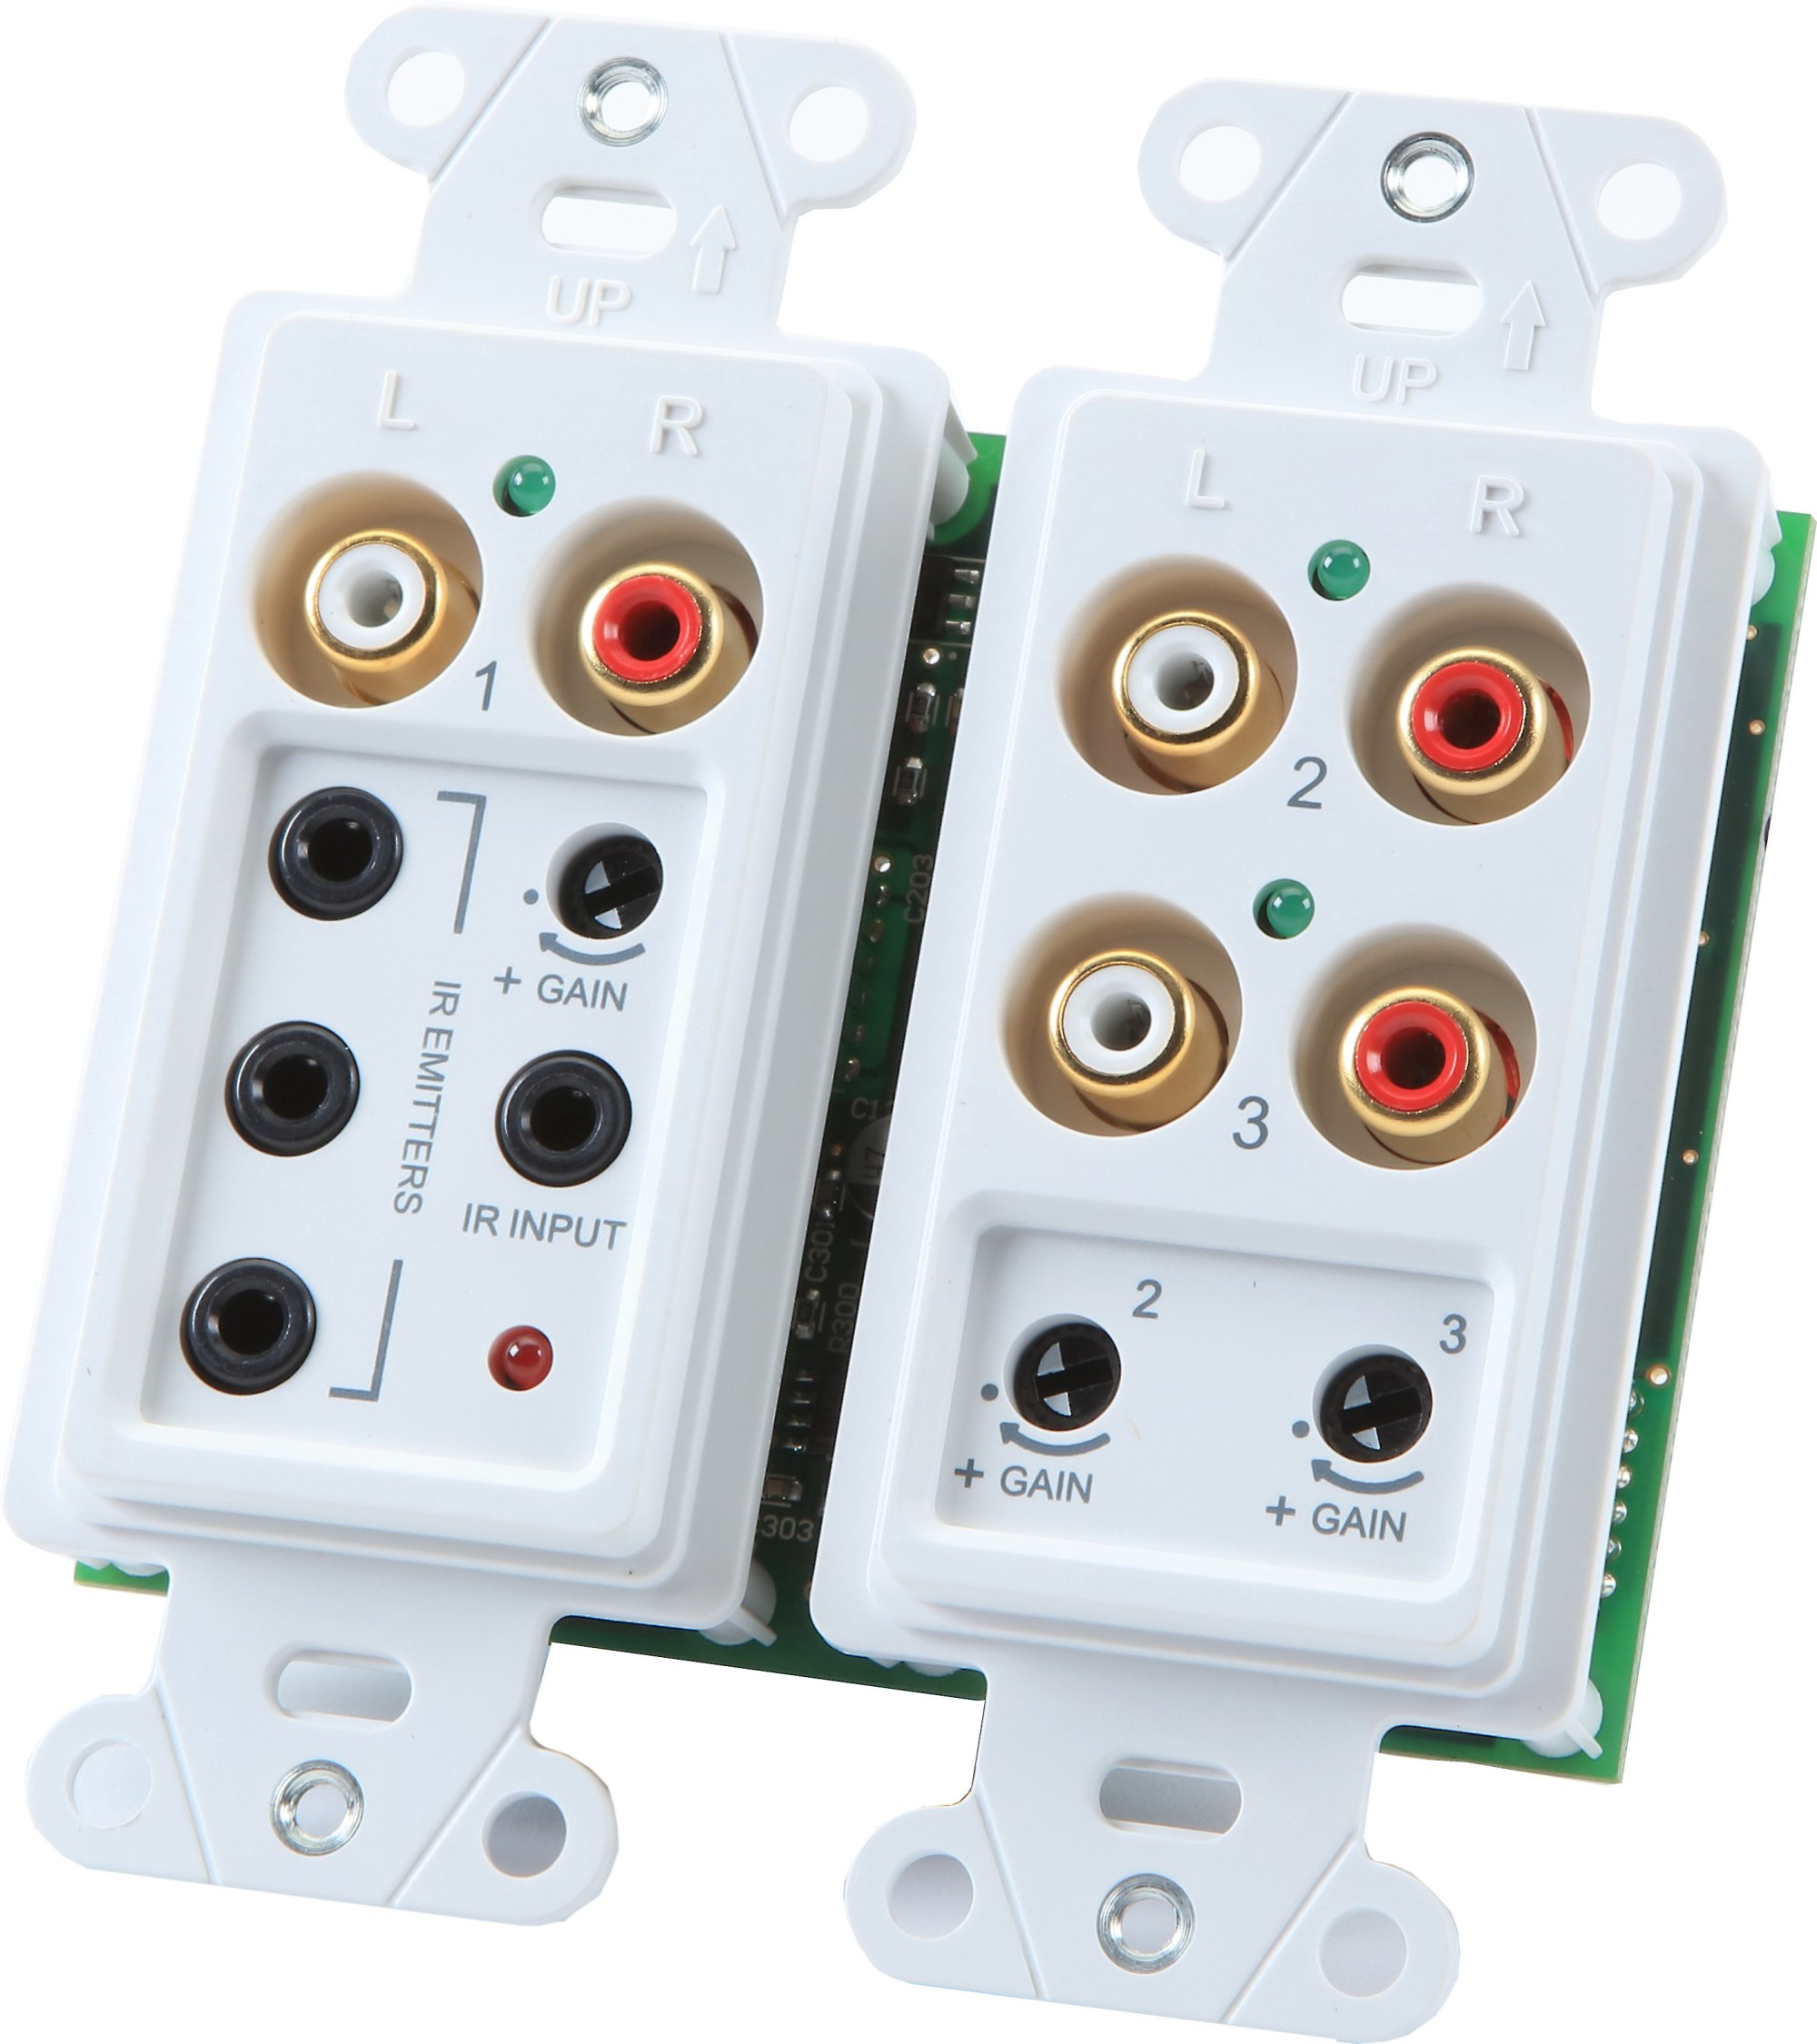 hight resolution of onq lyriq flush mount triple source input in wall audio input module for lyriq multi room audio systems at crutchfield com